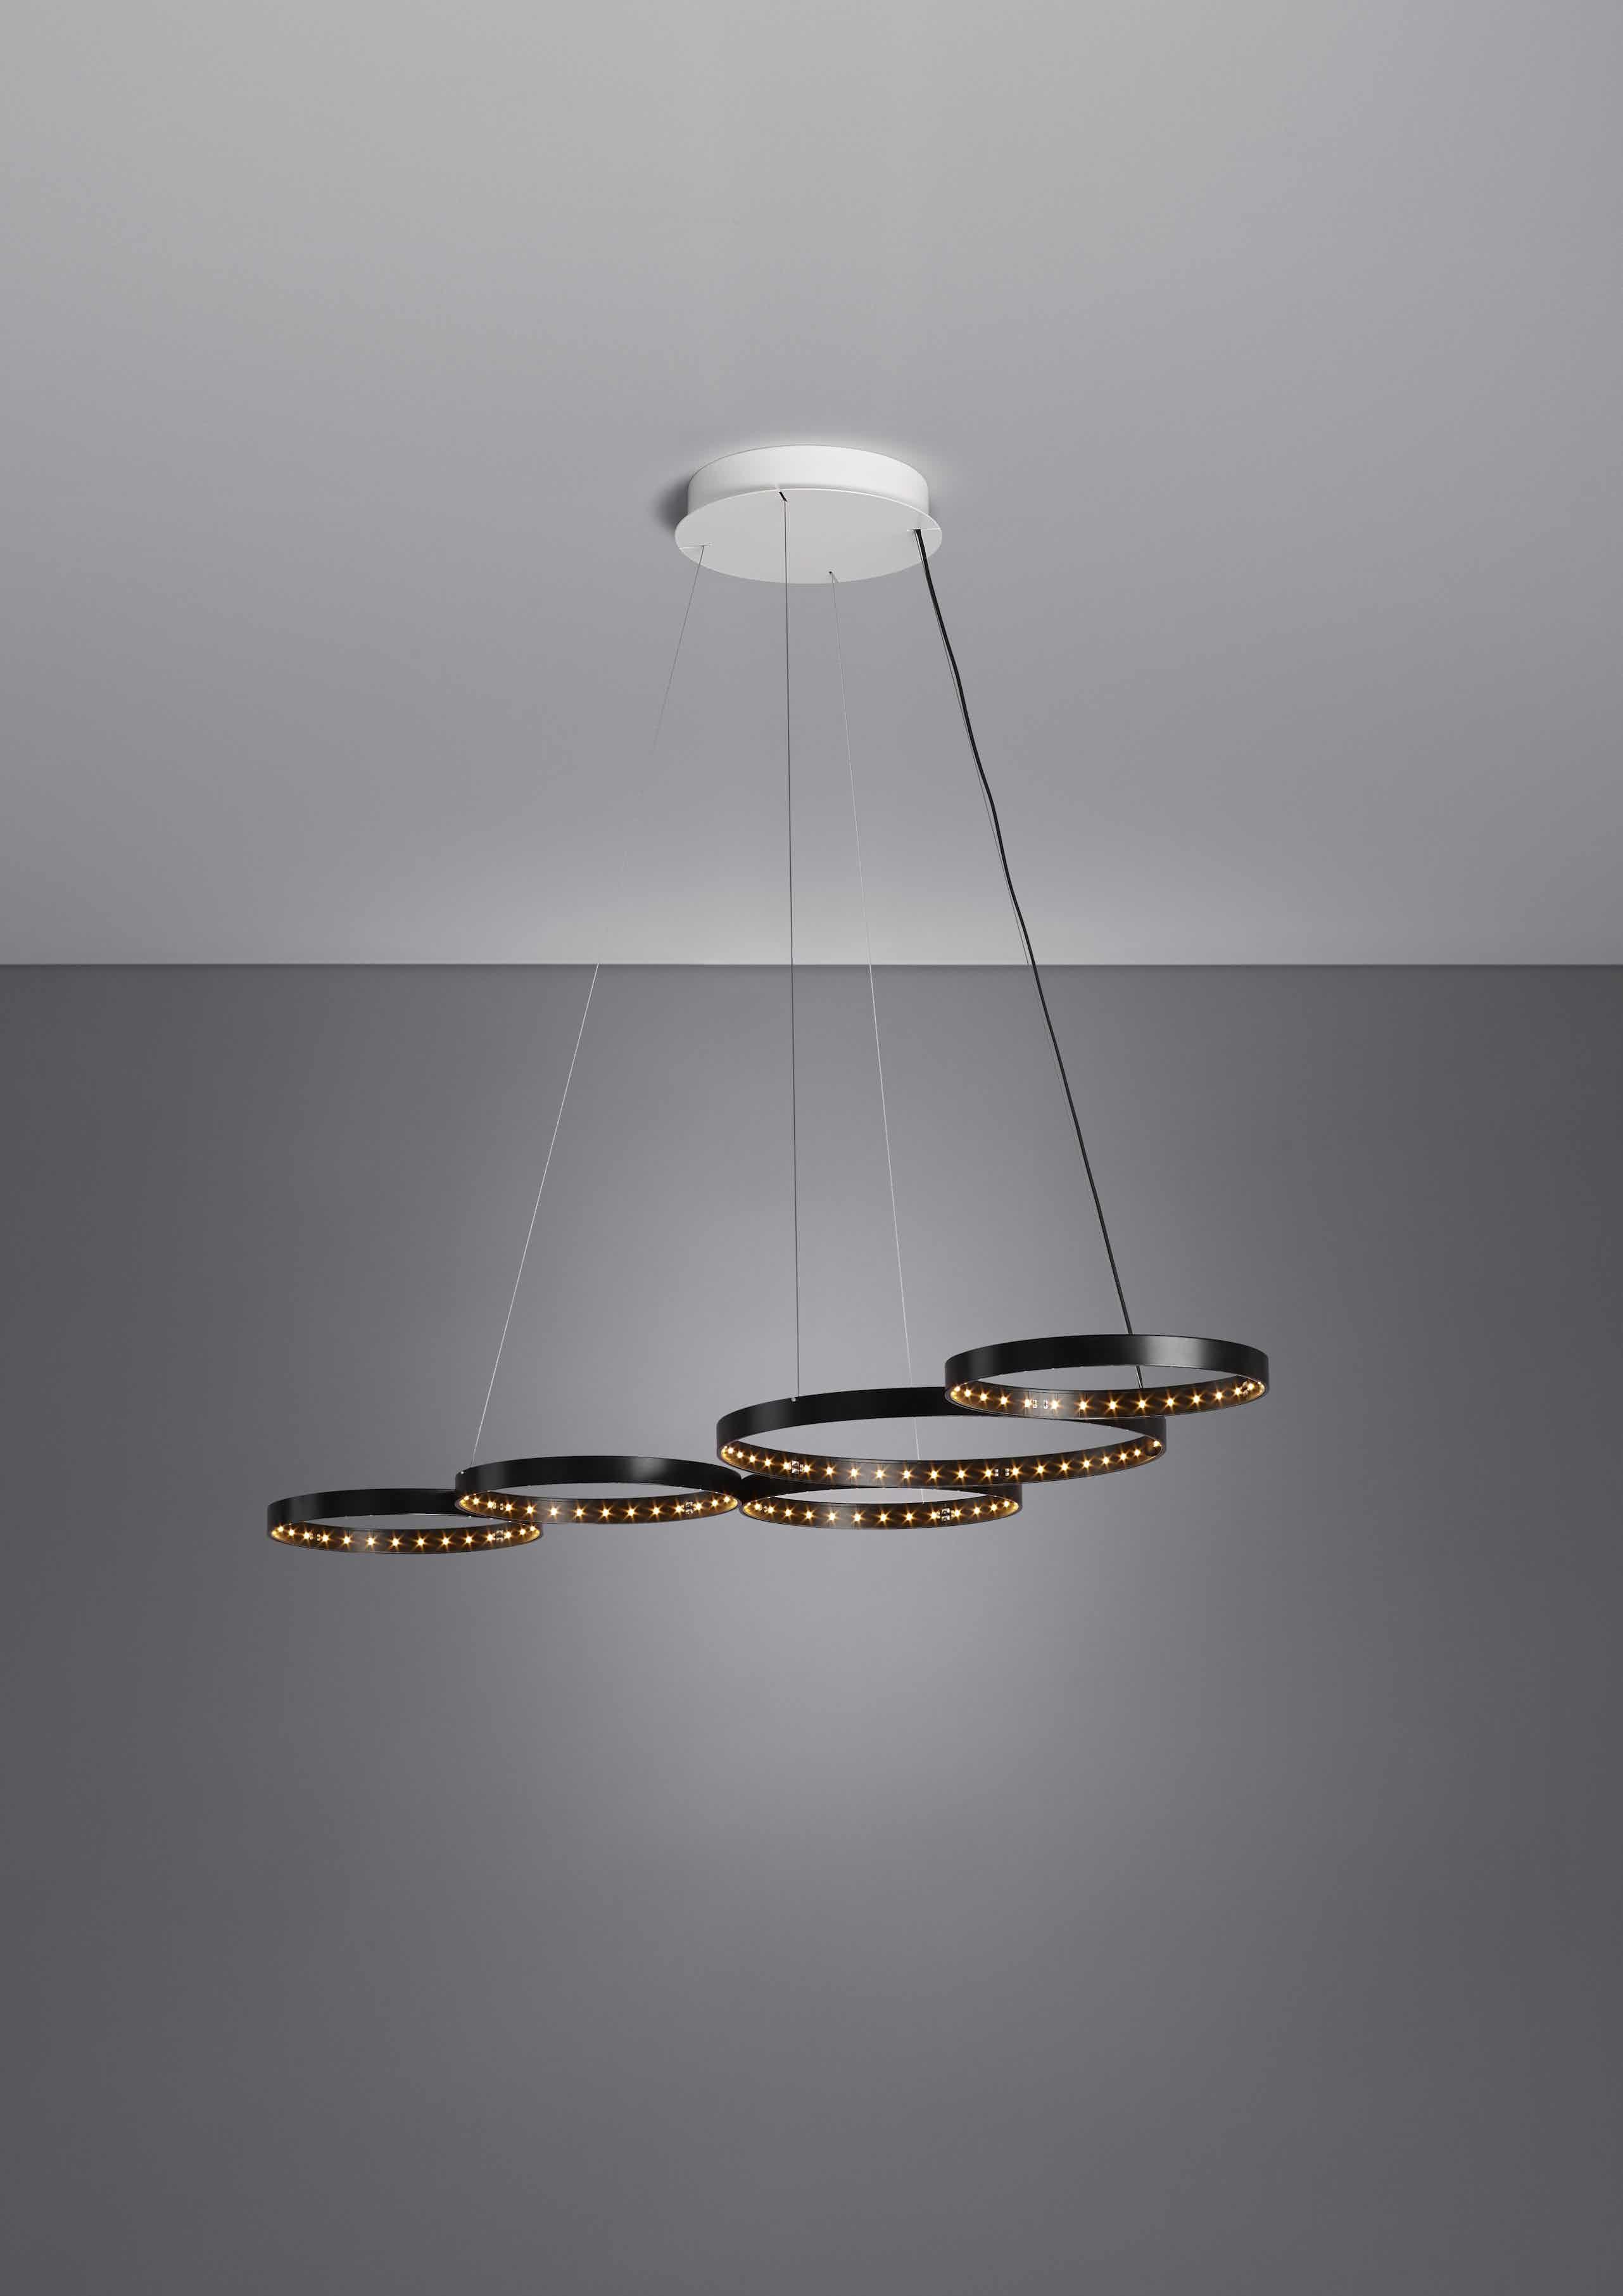 Le-deun-luminaires-super-8-hanging-lamp-black-position-3-haute-living